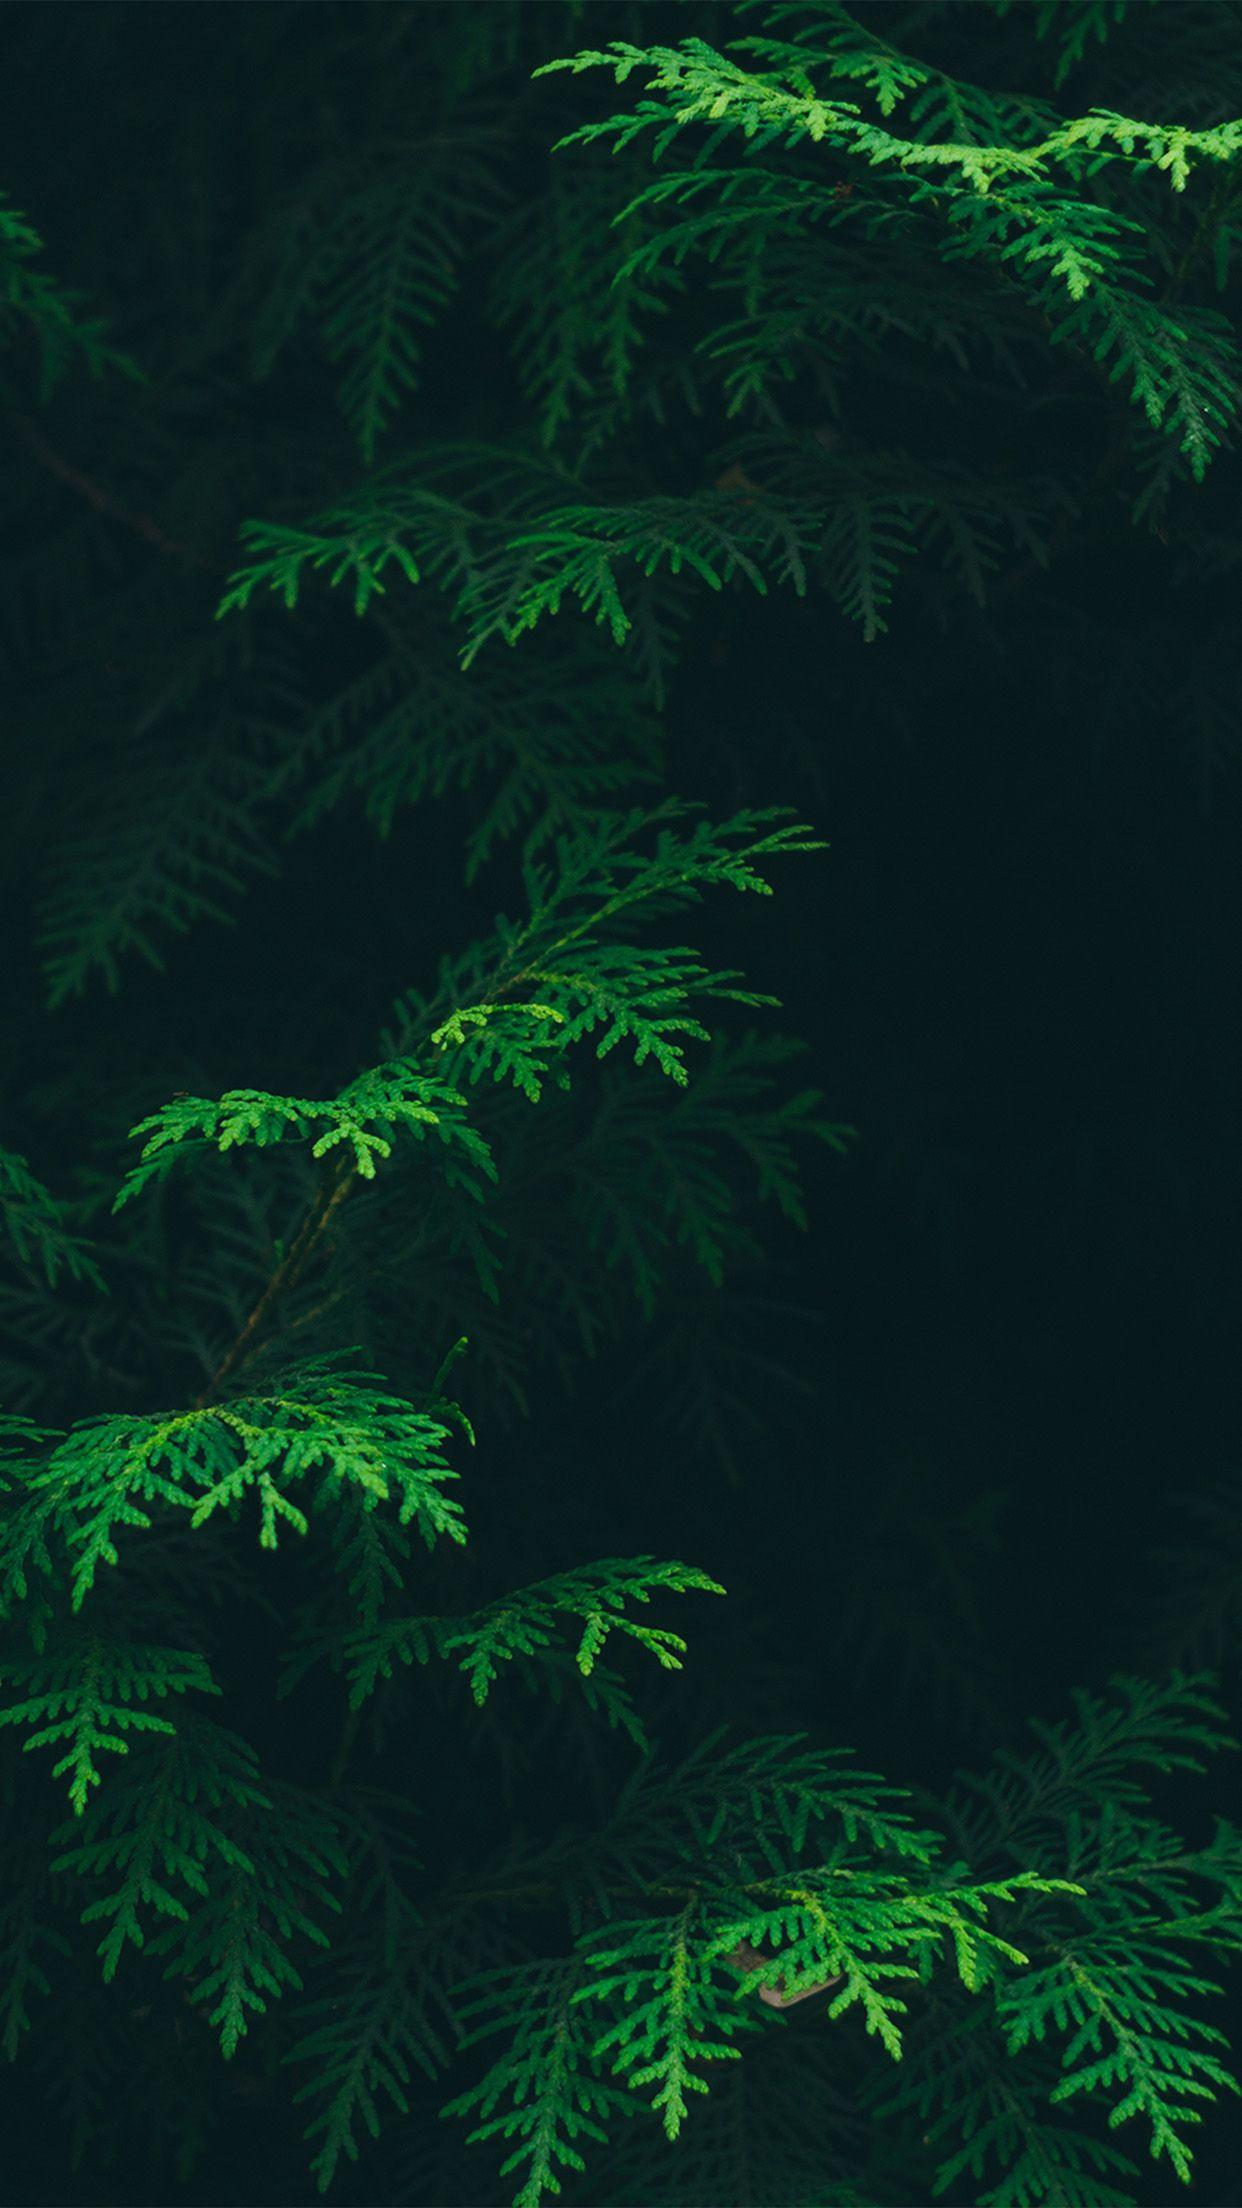 28dc6b8e6573ff451578e7d598a4b526.jpg (1242×2208) Зеленая